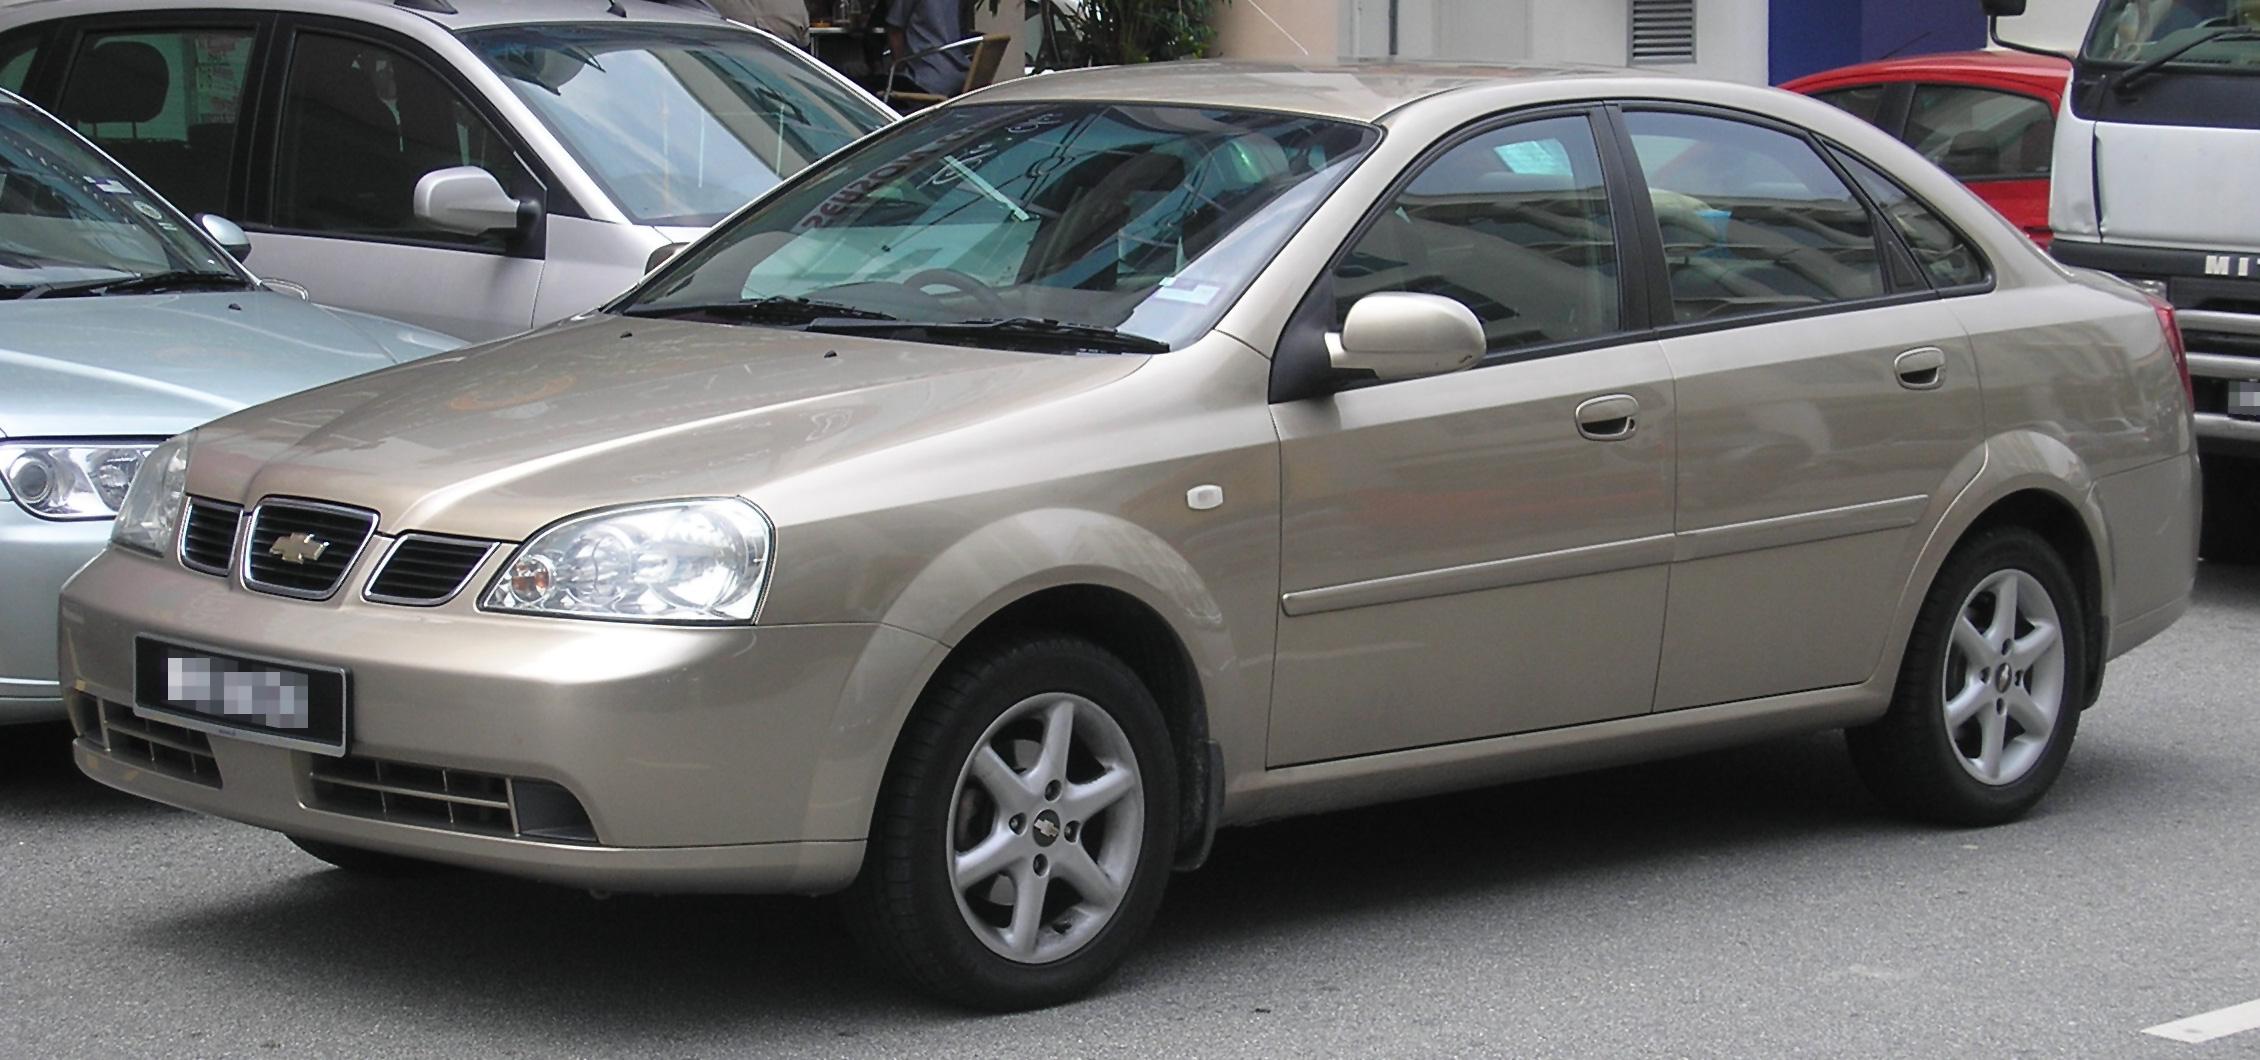 File:Chevrolet Optra (first generation) (front), Serdang.jpg ...